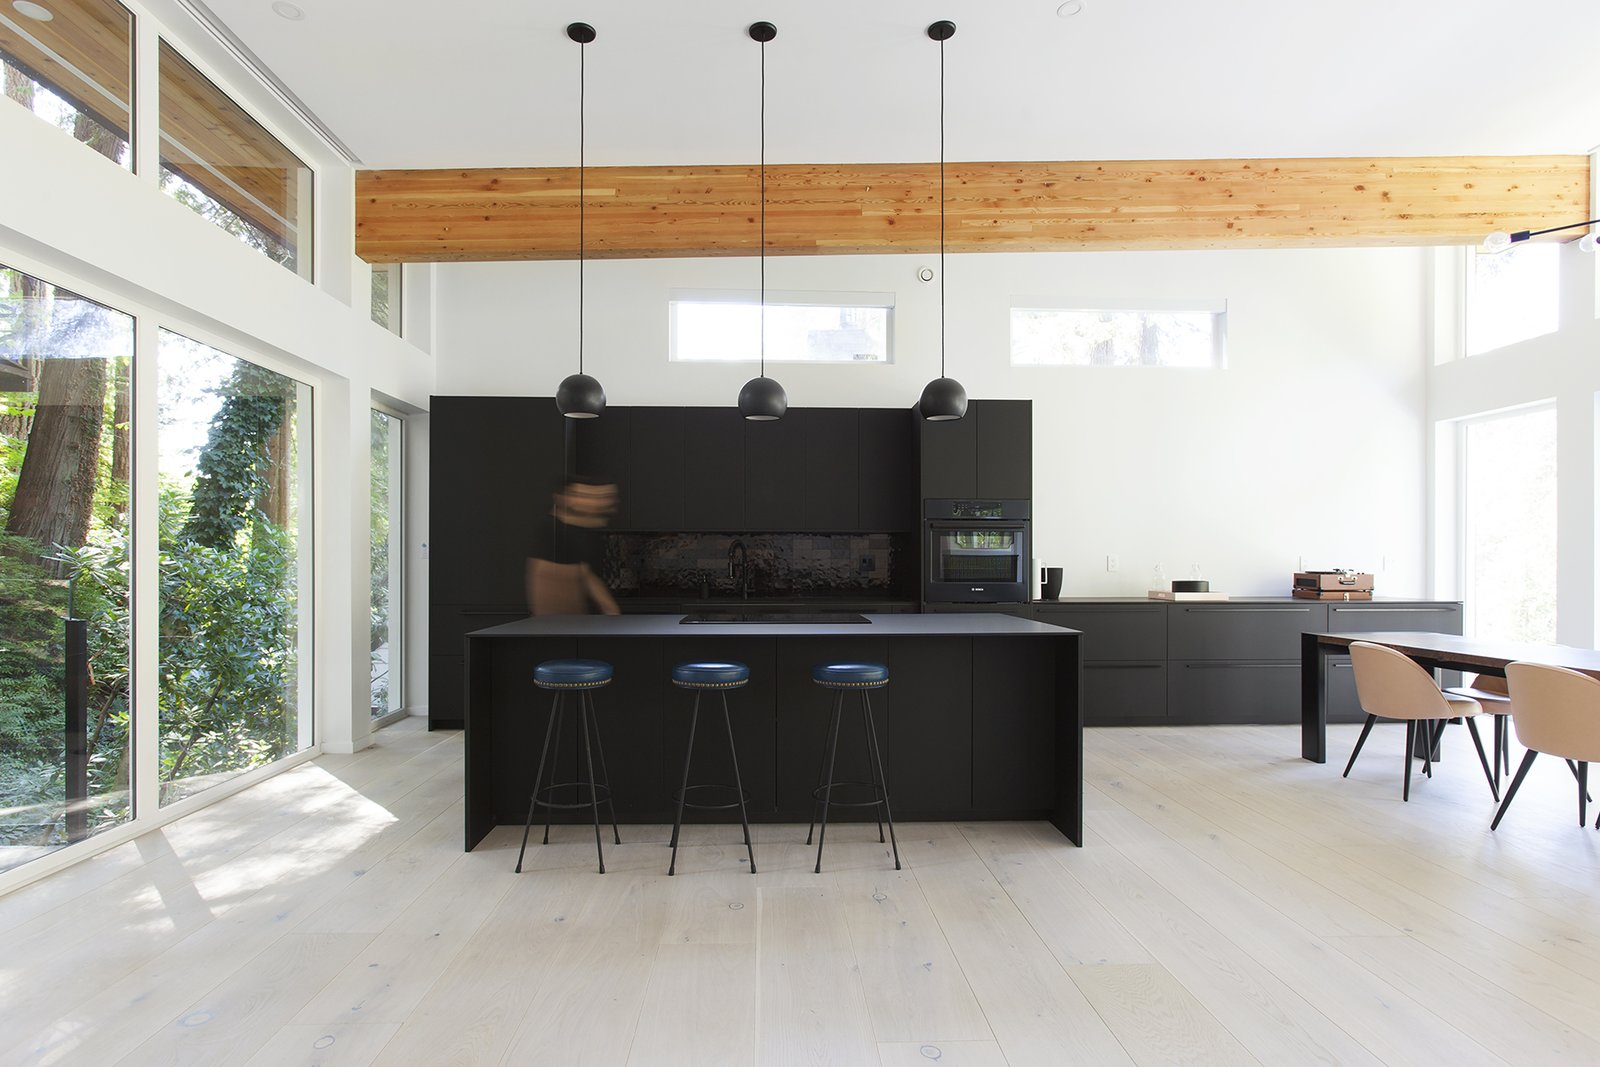 Capilano Crescent Residence kitchen